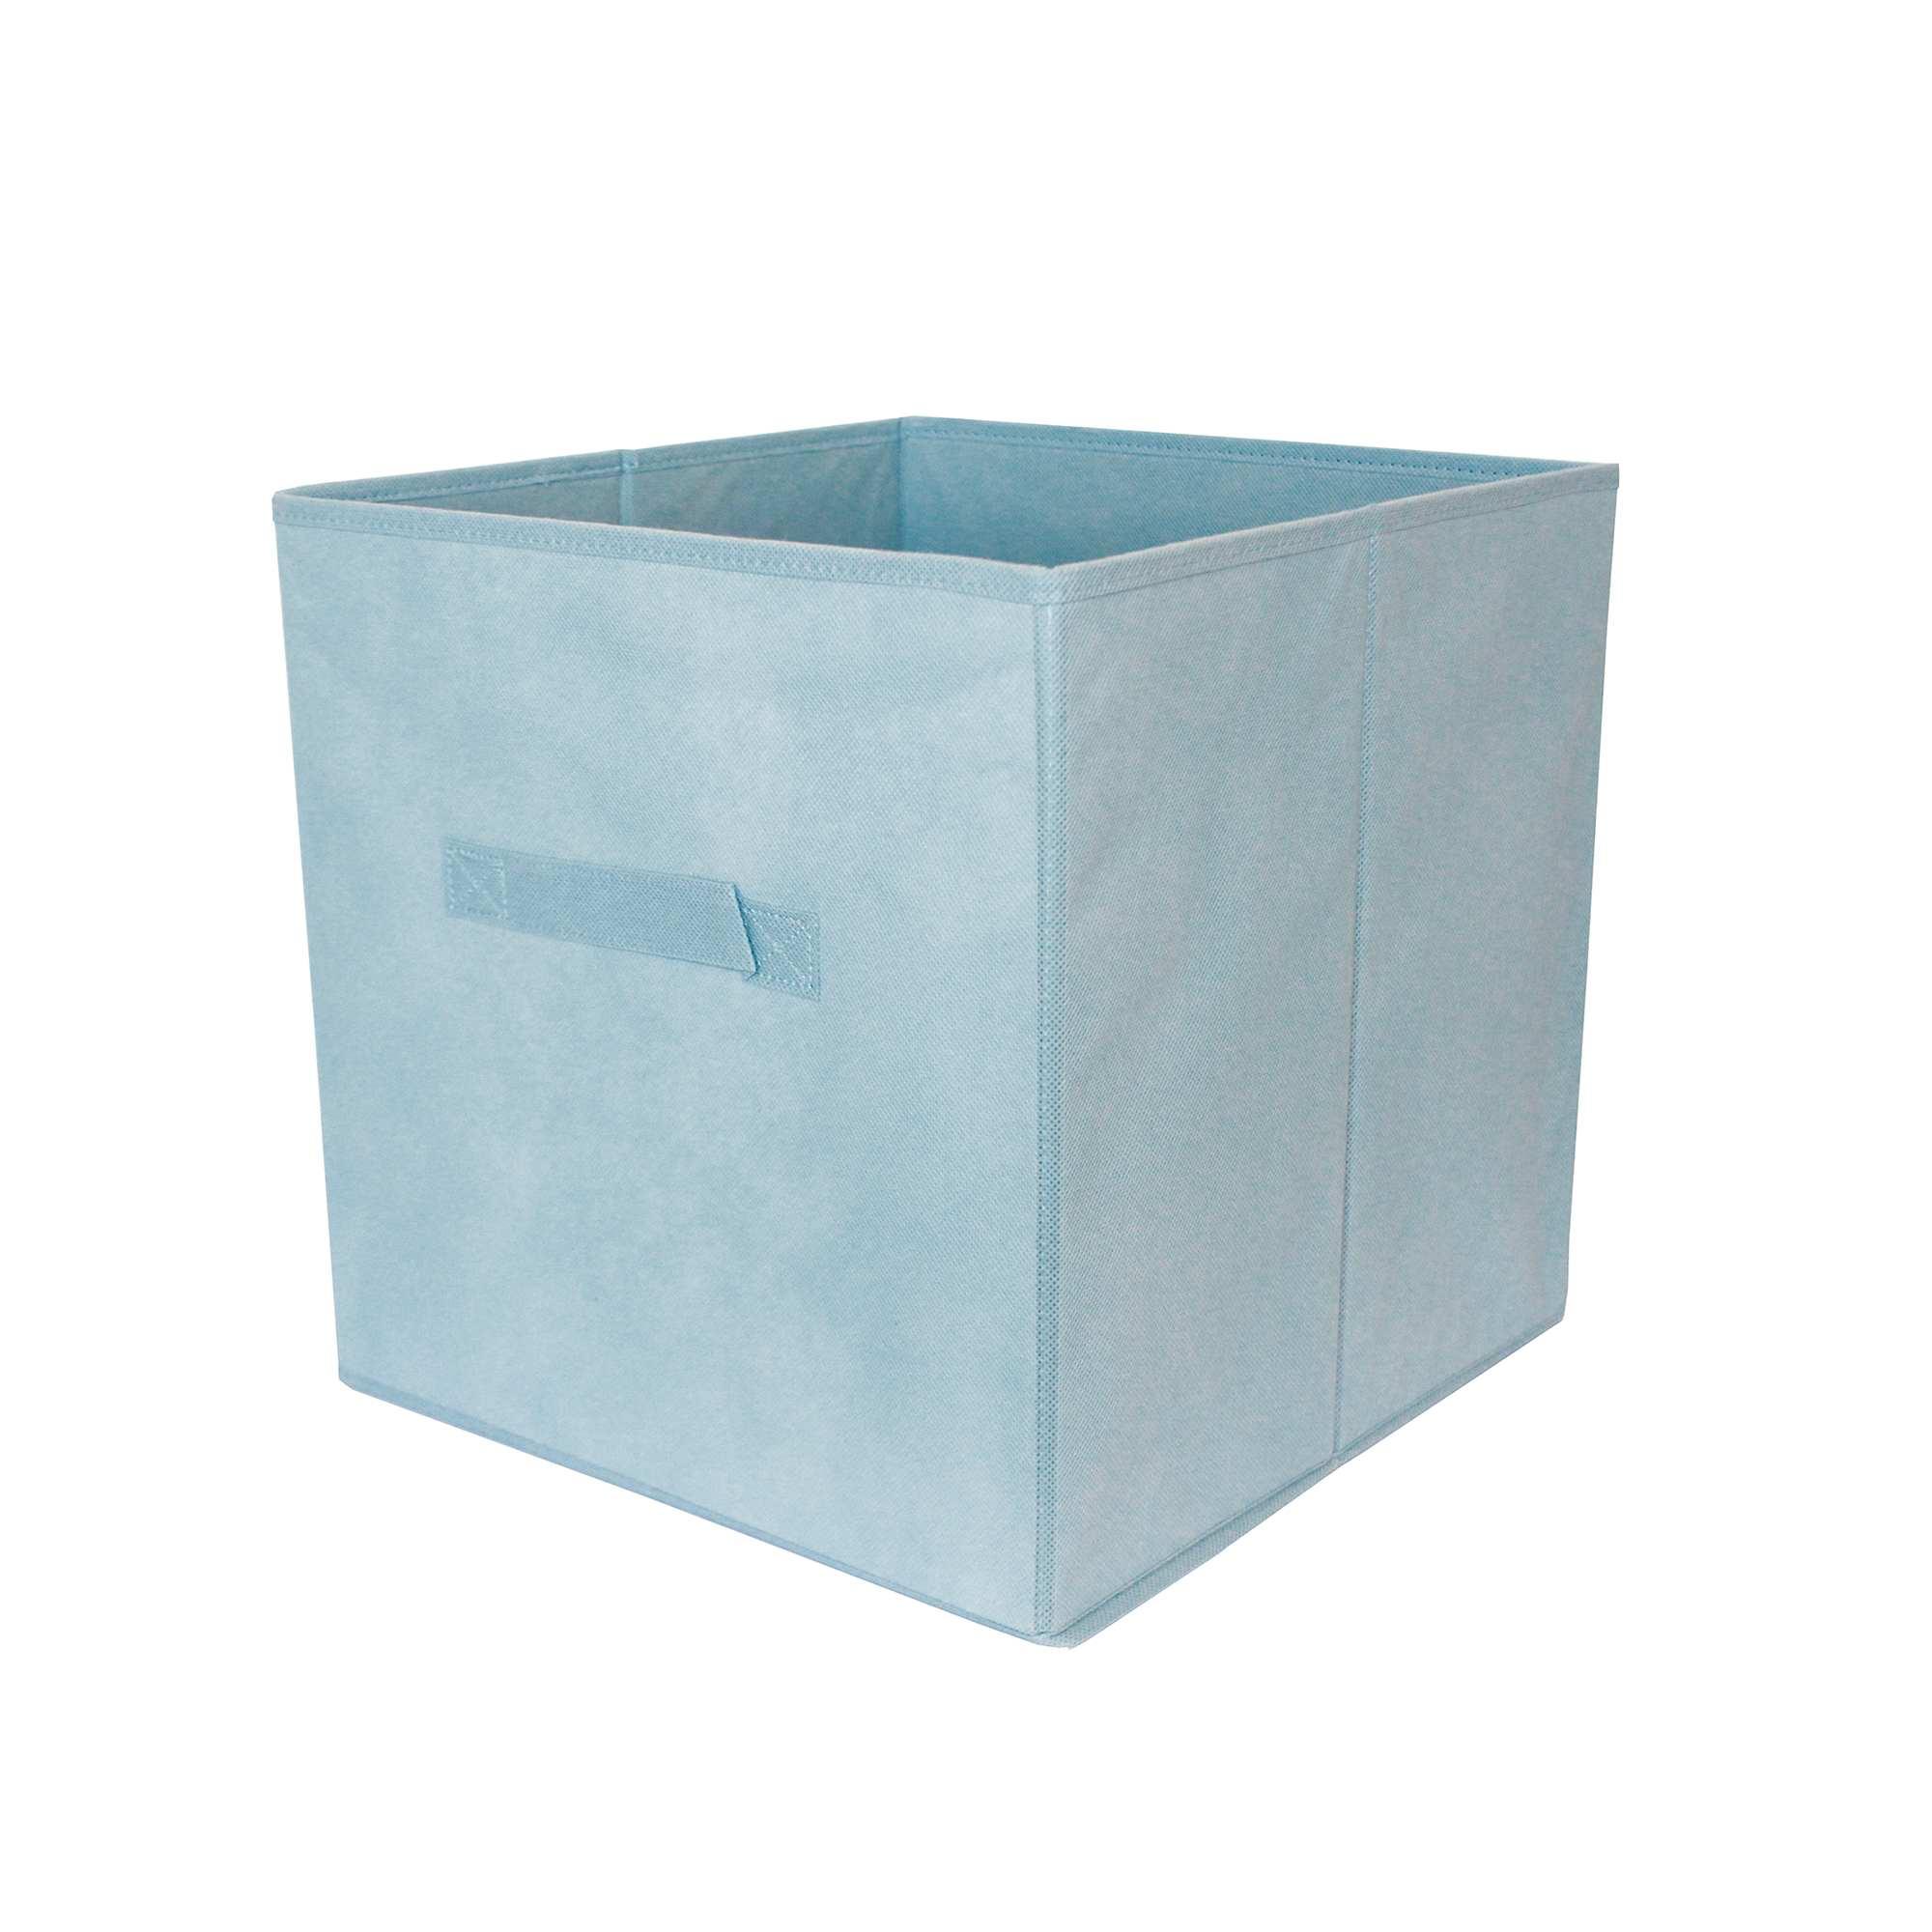 Panier pliable intiss linge de lit bleu ciel kiabi 4 00 - Ciel de lit bleu ...